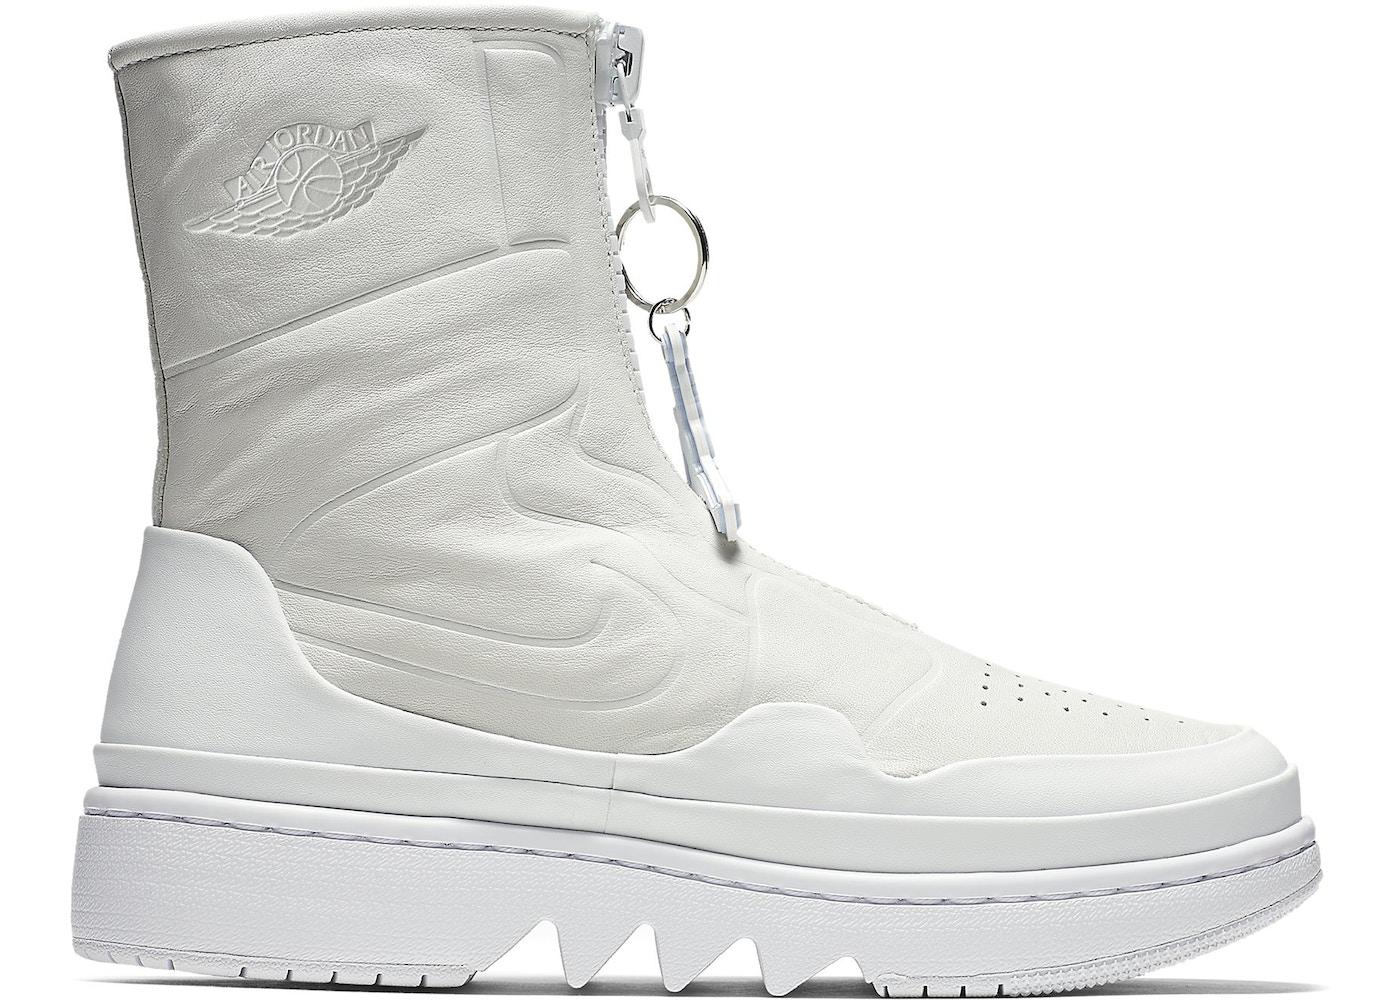 Nike Air Jordan Jester